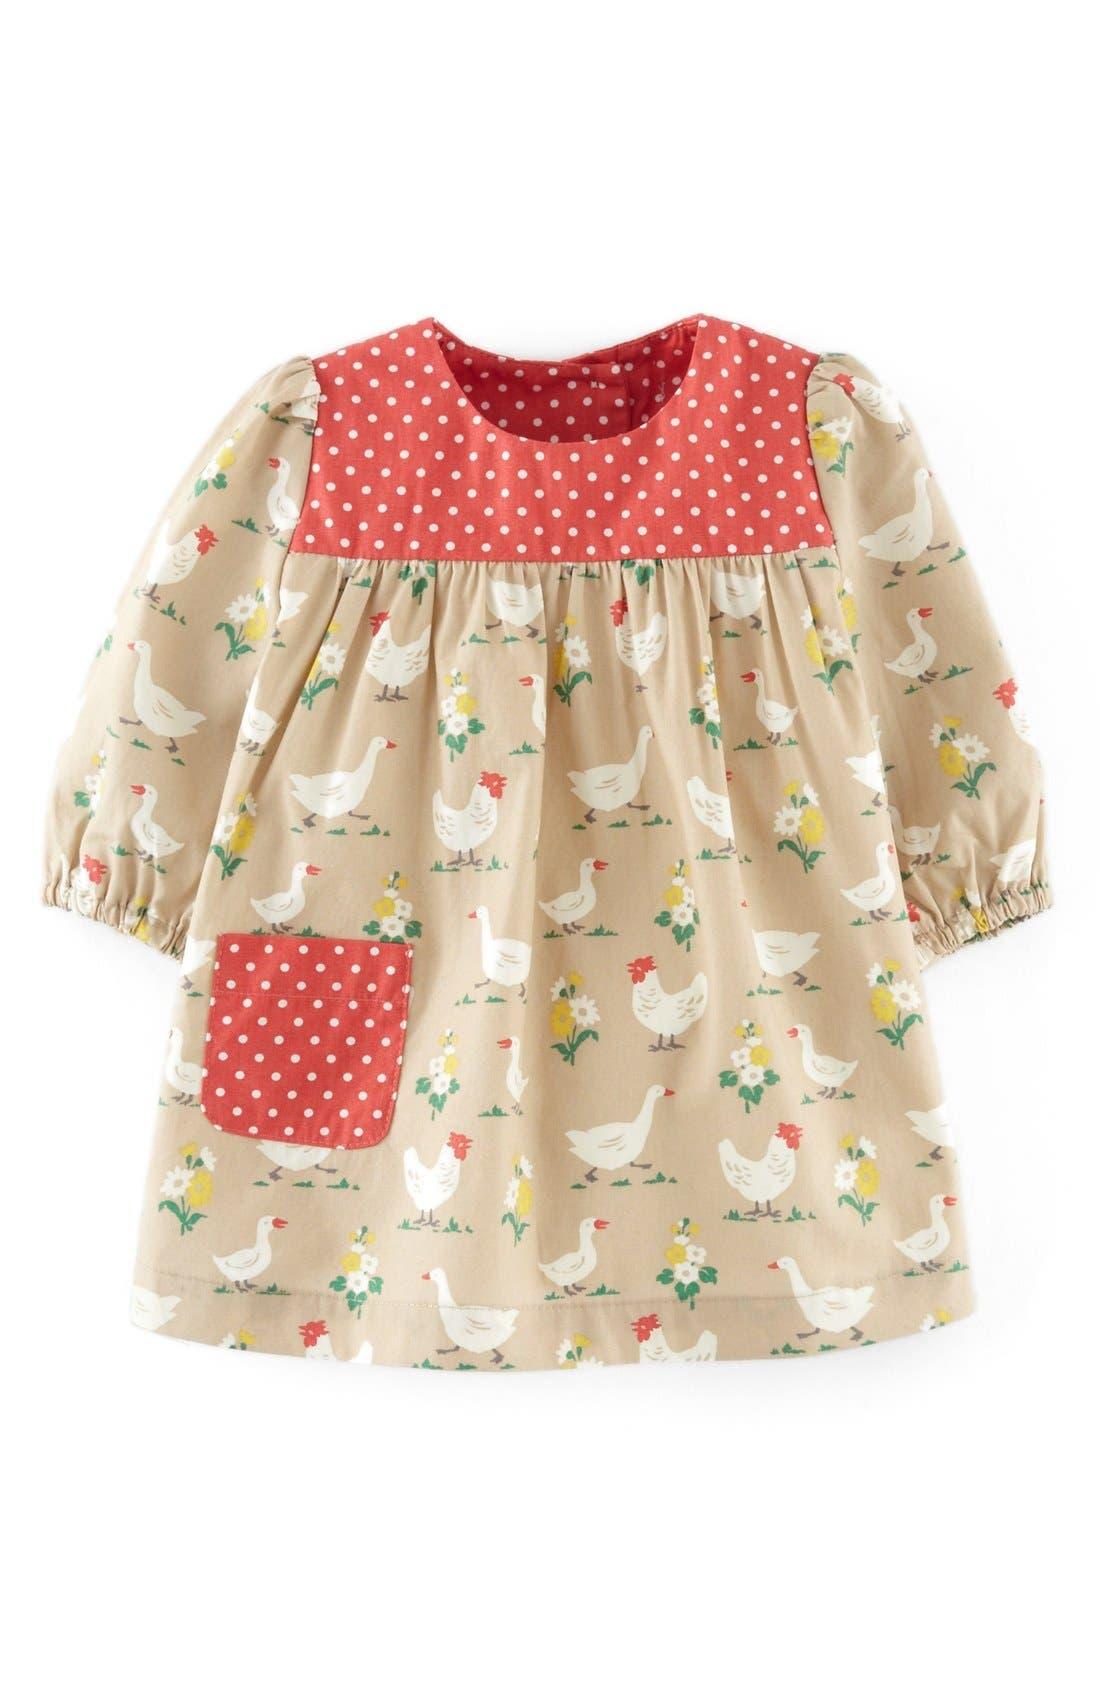 Alternate Image 1 Selected - Mini Boden Hotchpotch Dress (Baby Girls)